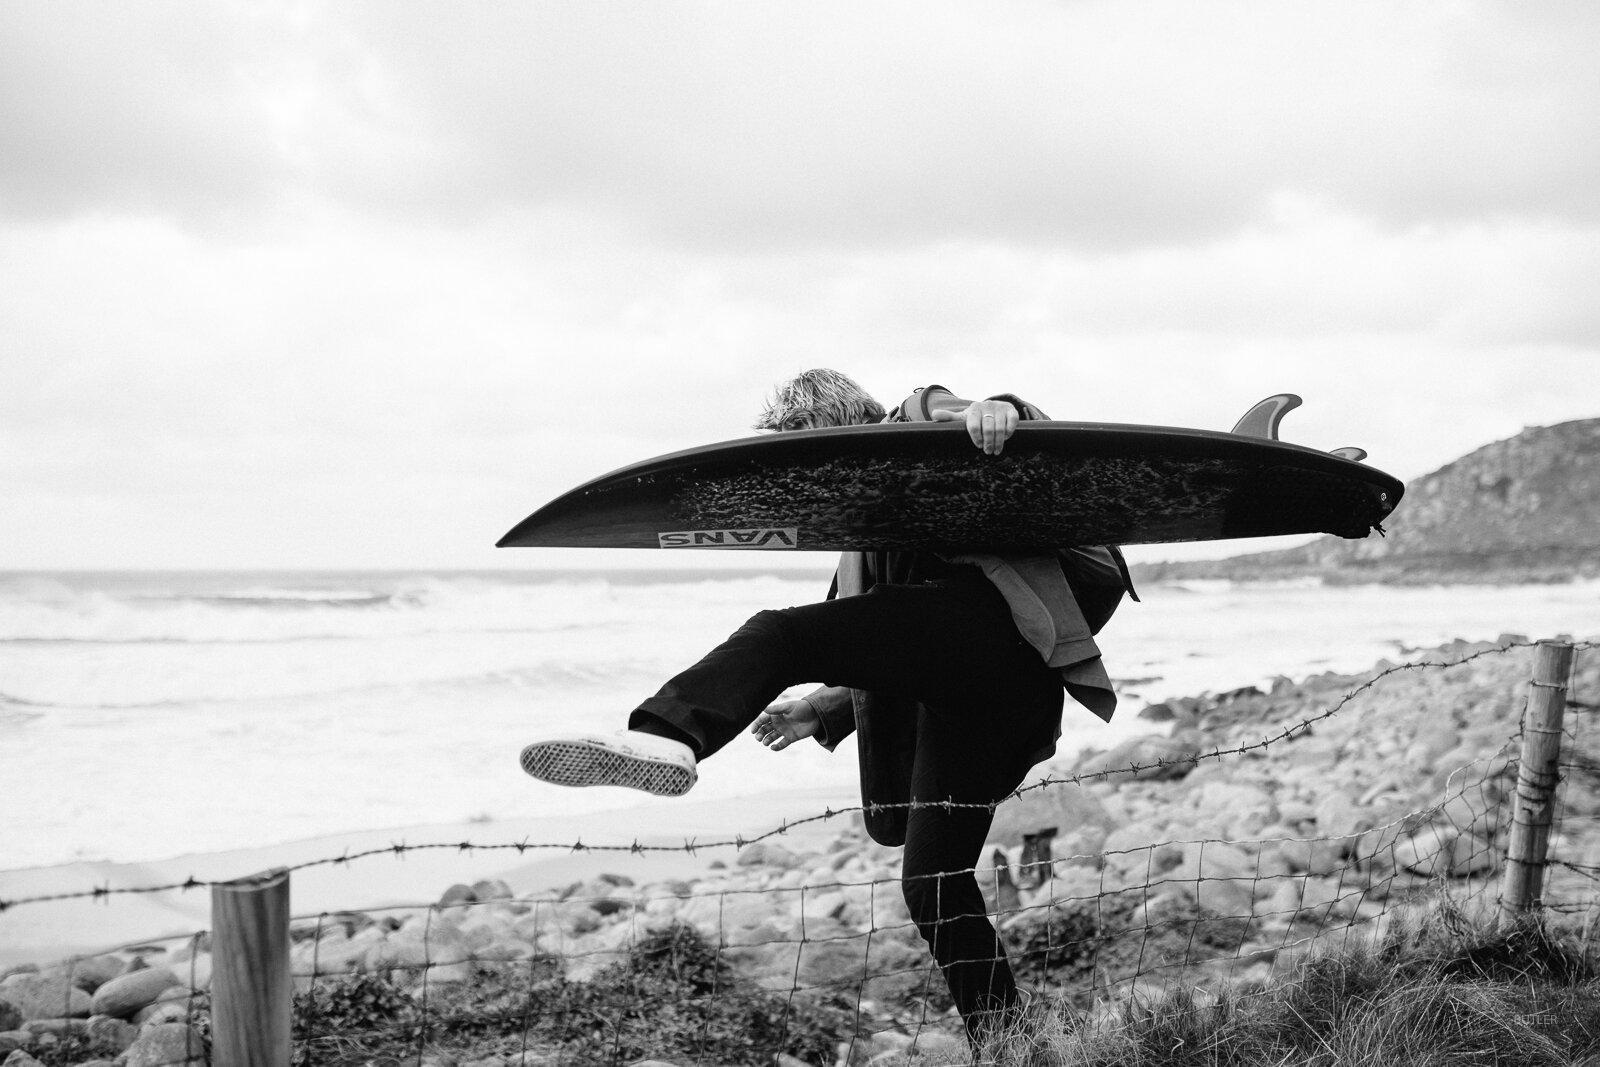 toby-butler-photo-devon-cornwall-lifestyle-photogrpher-photography-travel-culture-commercial-editorial-advertising-marketing-photo-surfer-girl-swimwear-sports-wear-clothing-england-united-kingdom-europe75.jpg